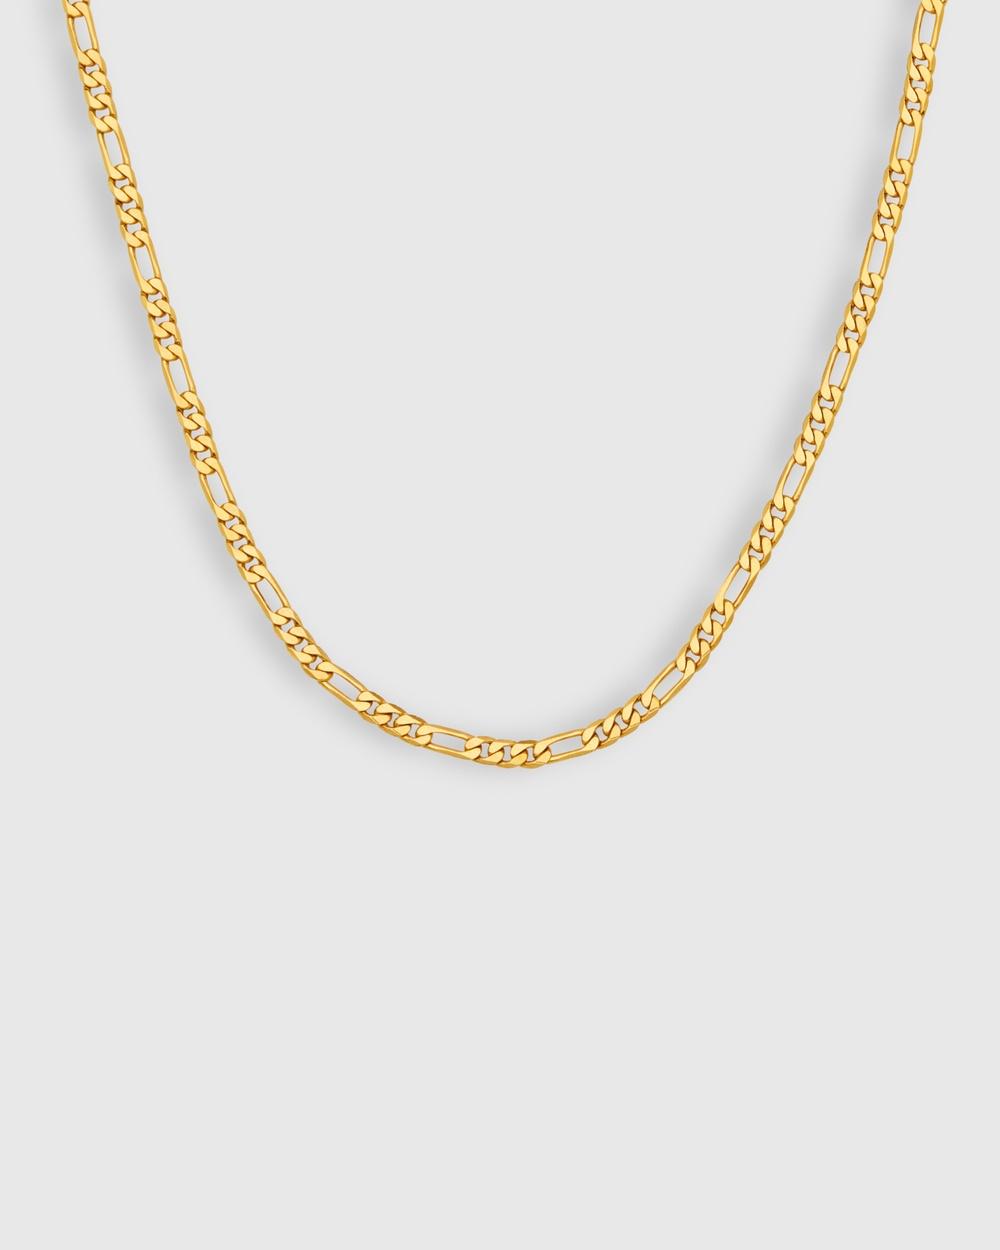 ALIX YANG Jemma Chain Jewellery Gold